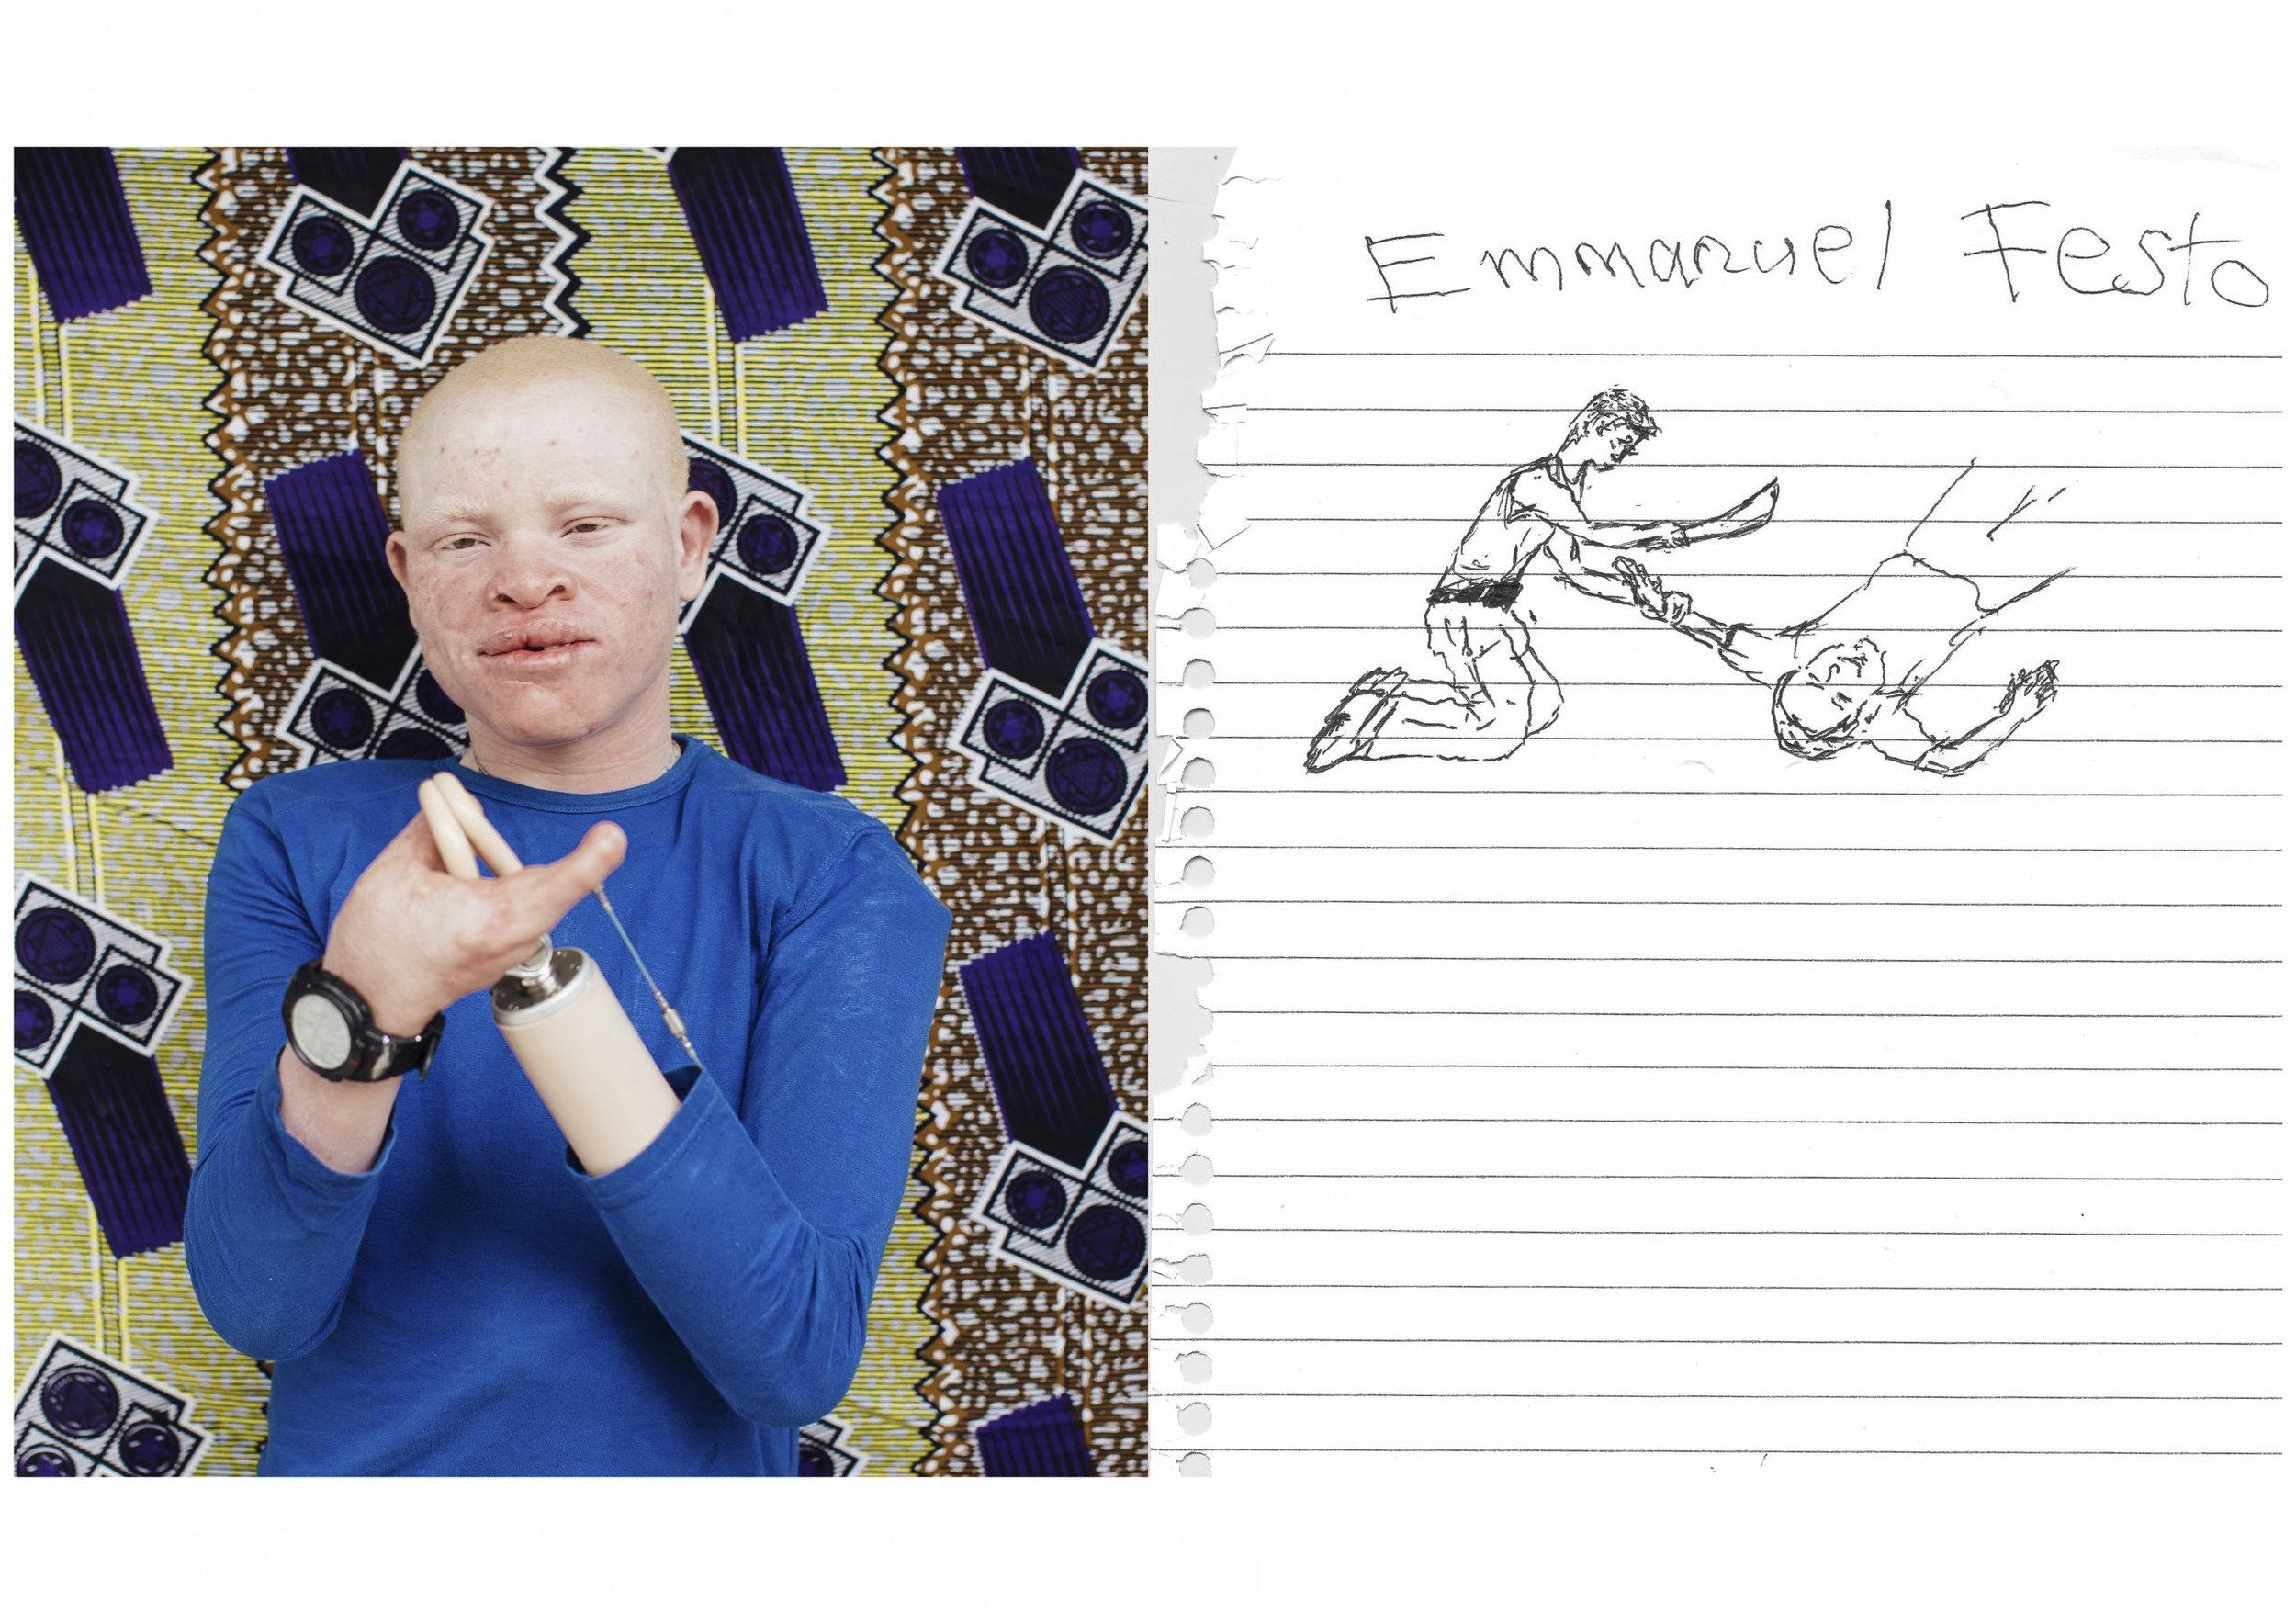 Emmanuel Festo      A drawing of his attack.